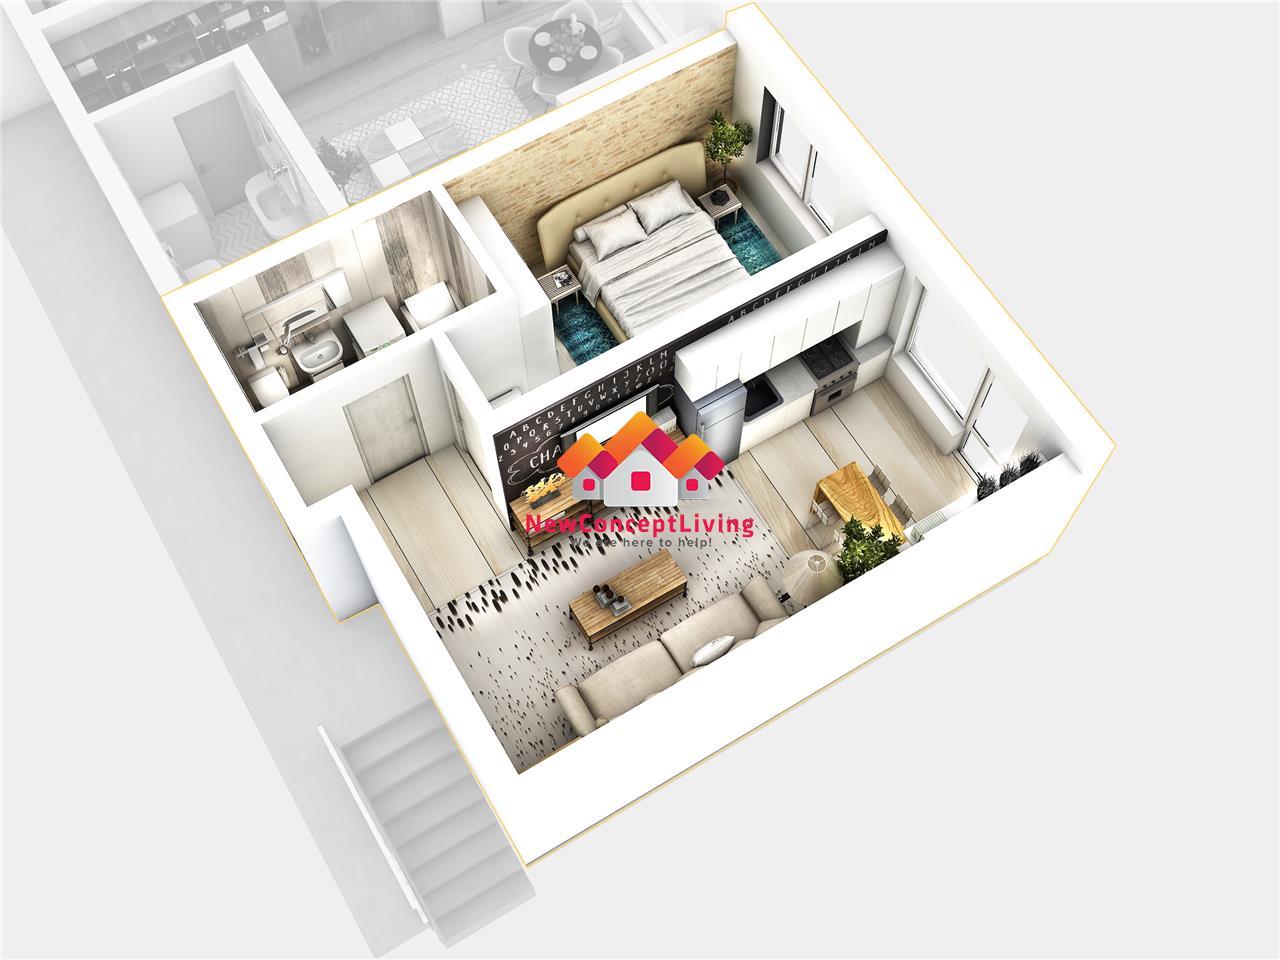 Apartament 2 camere - ansamblu rezidențial nou lângă lac